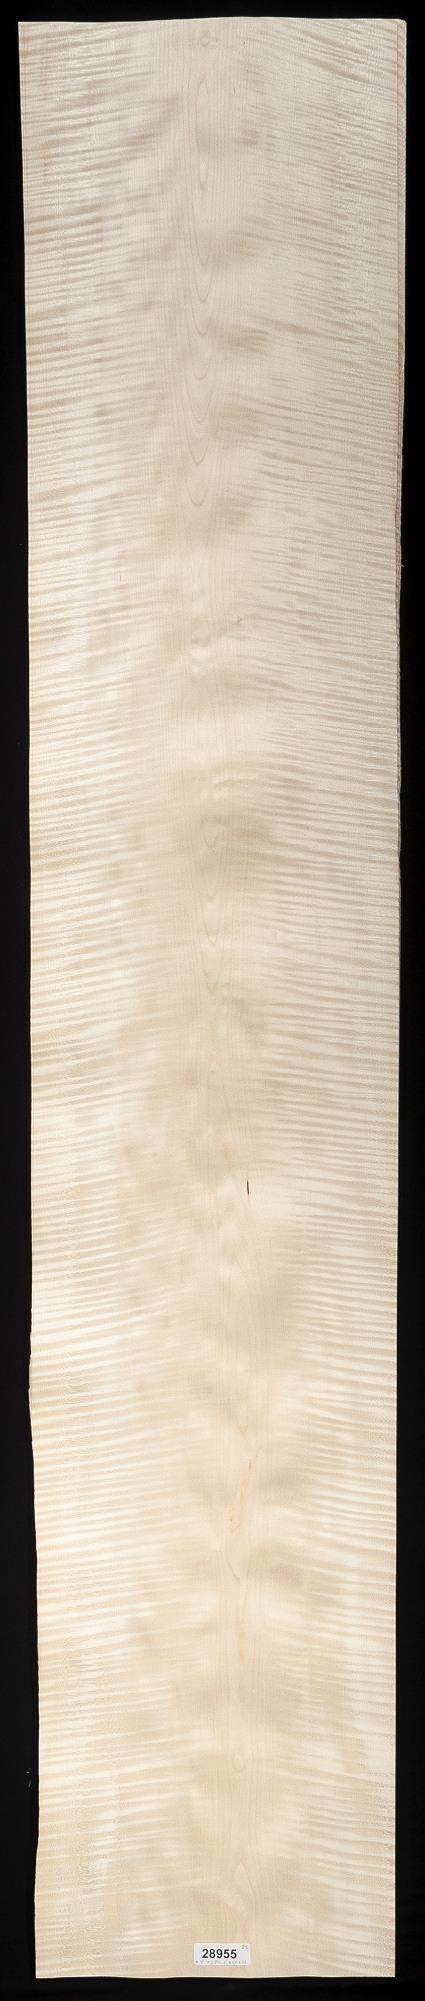 Curly English Sycamore Veneer Sheet